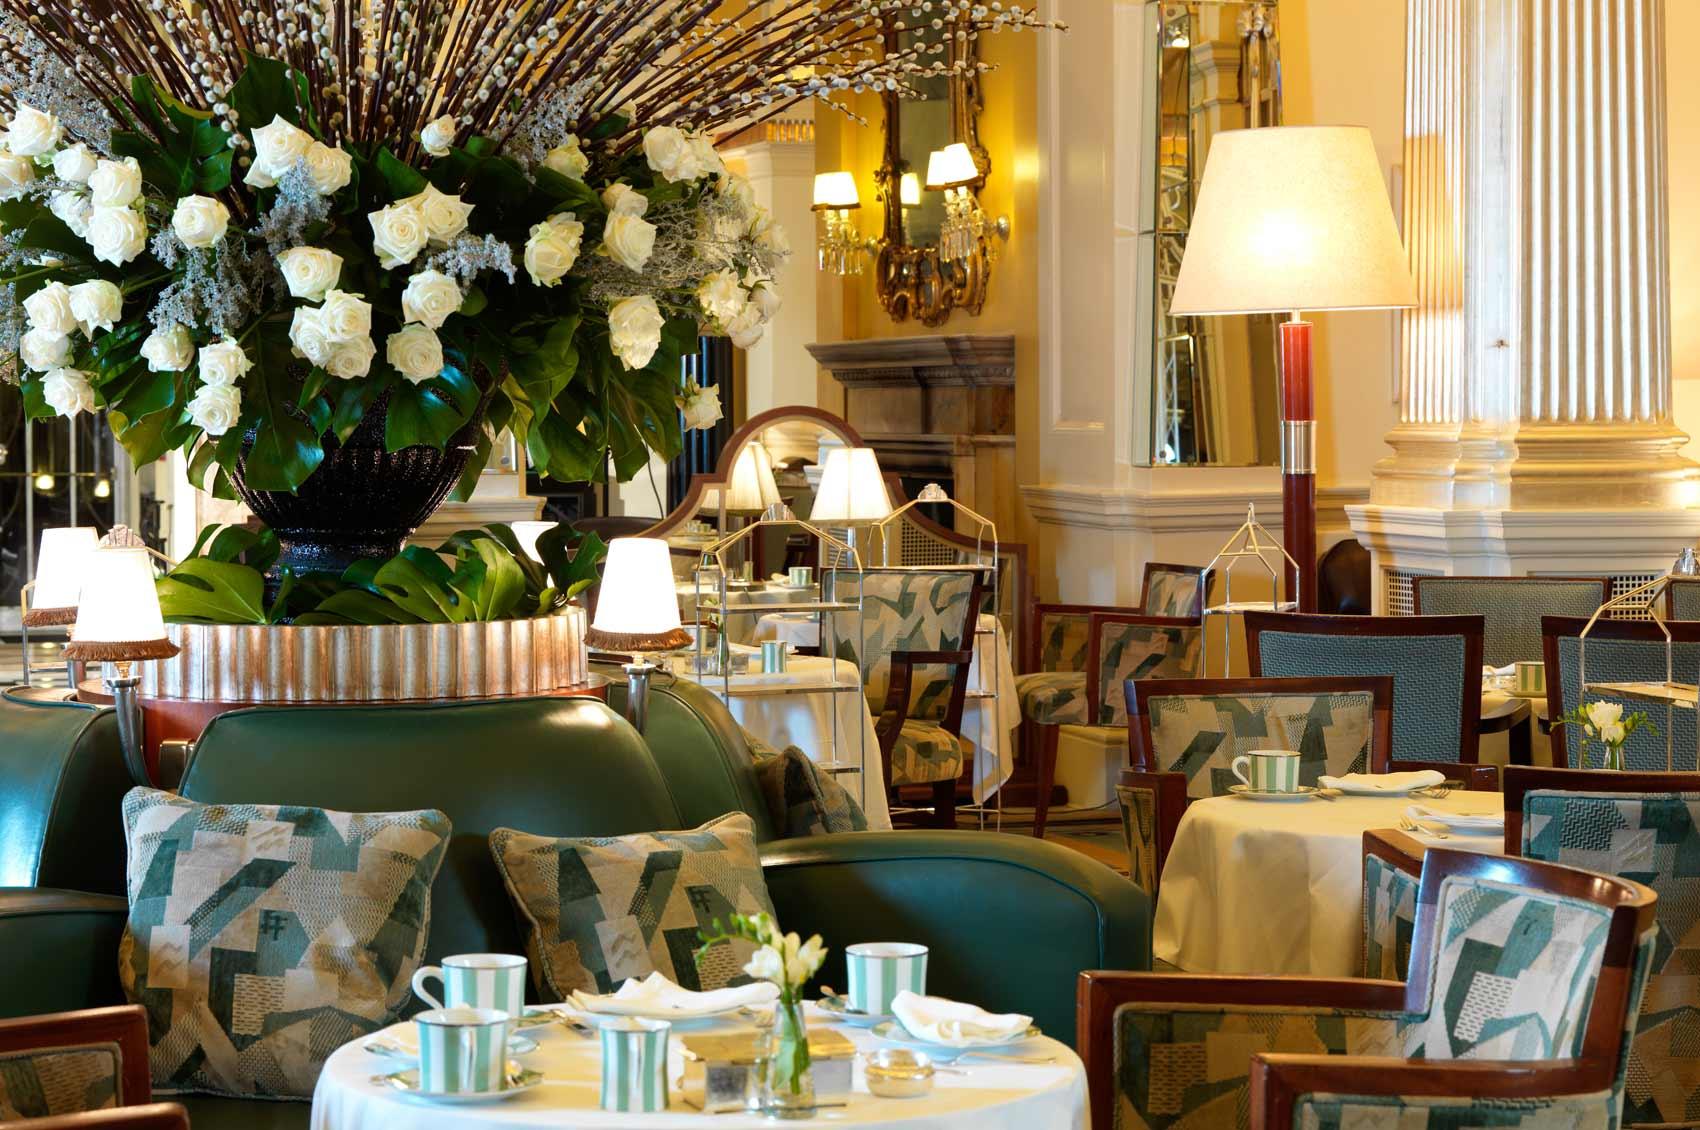 Vienna hotels fodor s - Vienna Hotels Fodor S 48